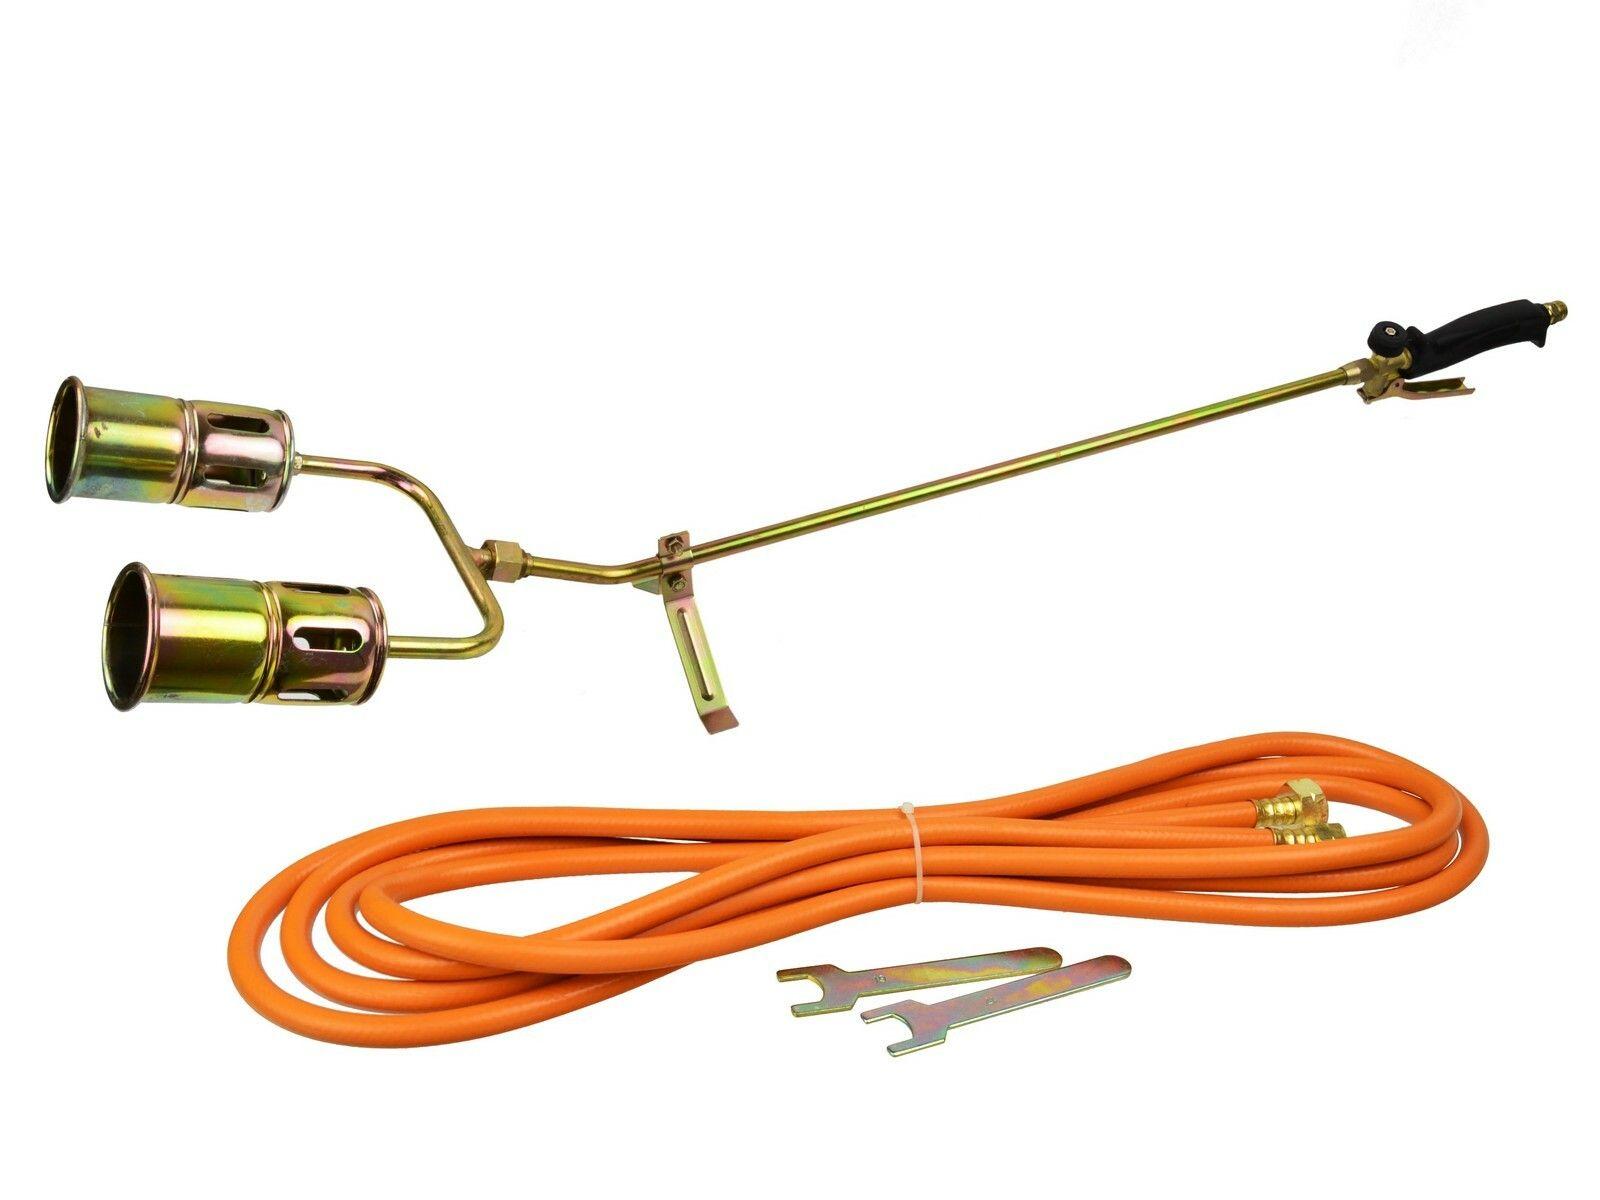 Plynový hořák MAX-2 (850mm), 5m hadice GEKO